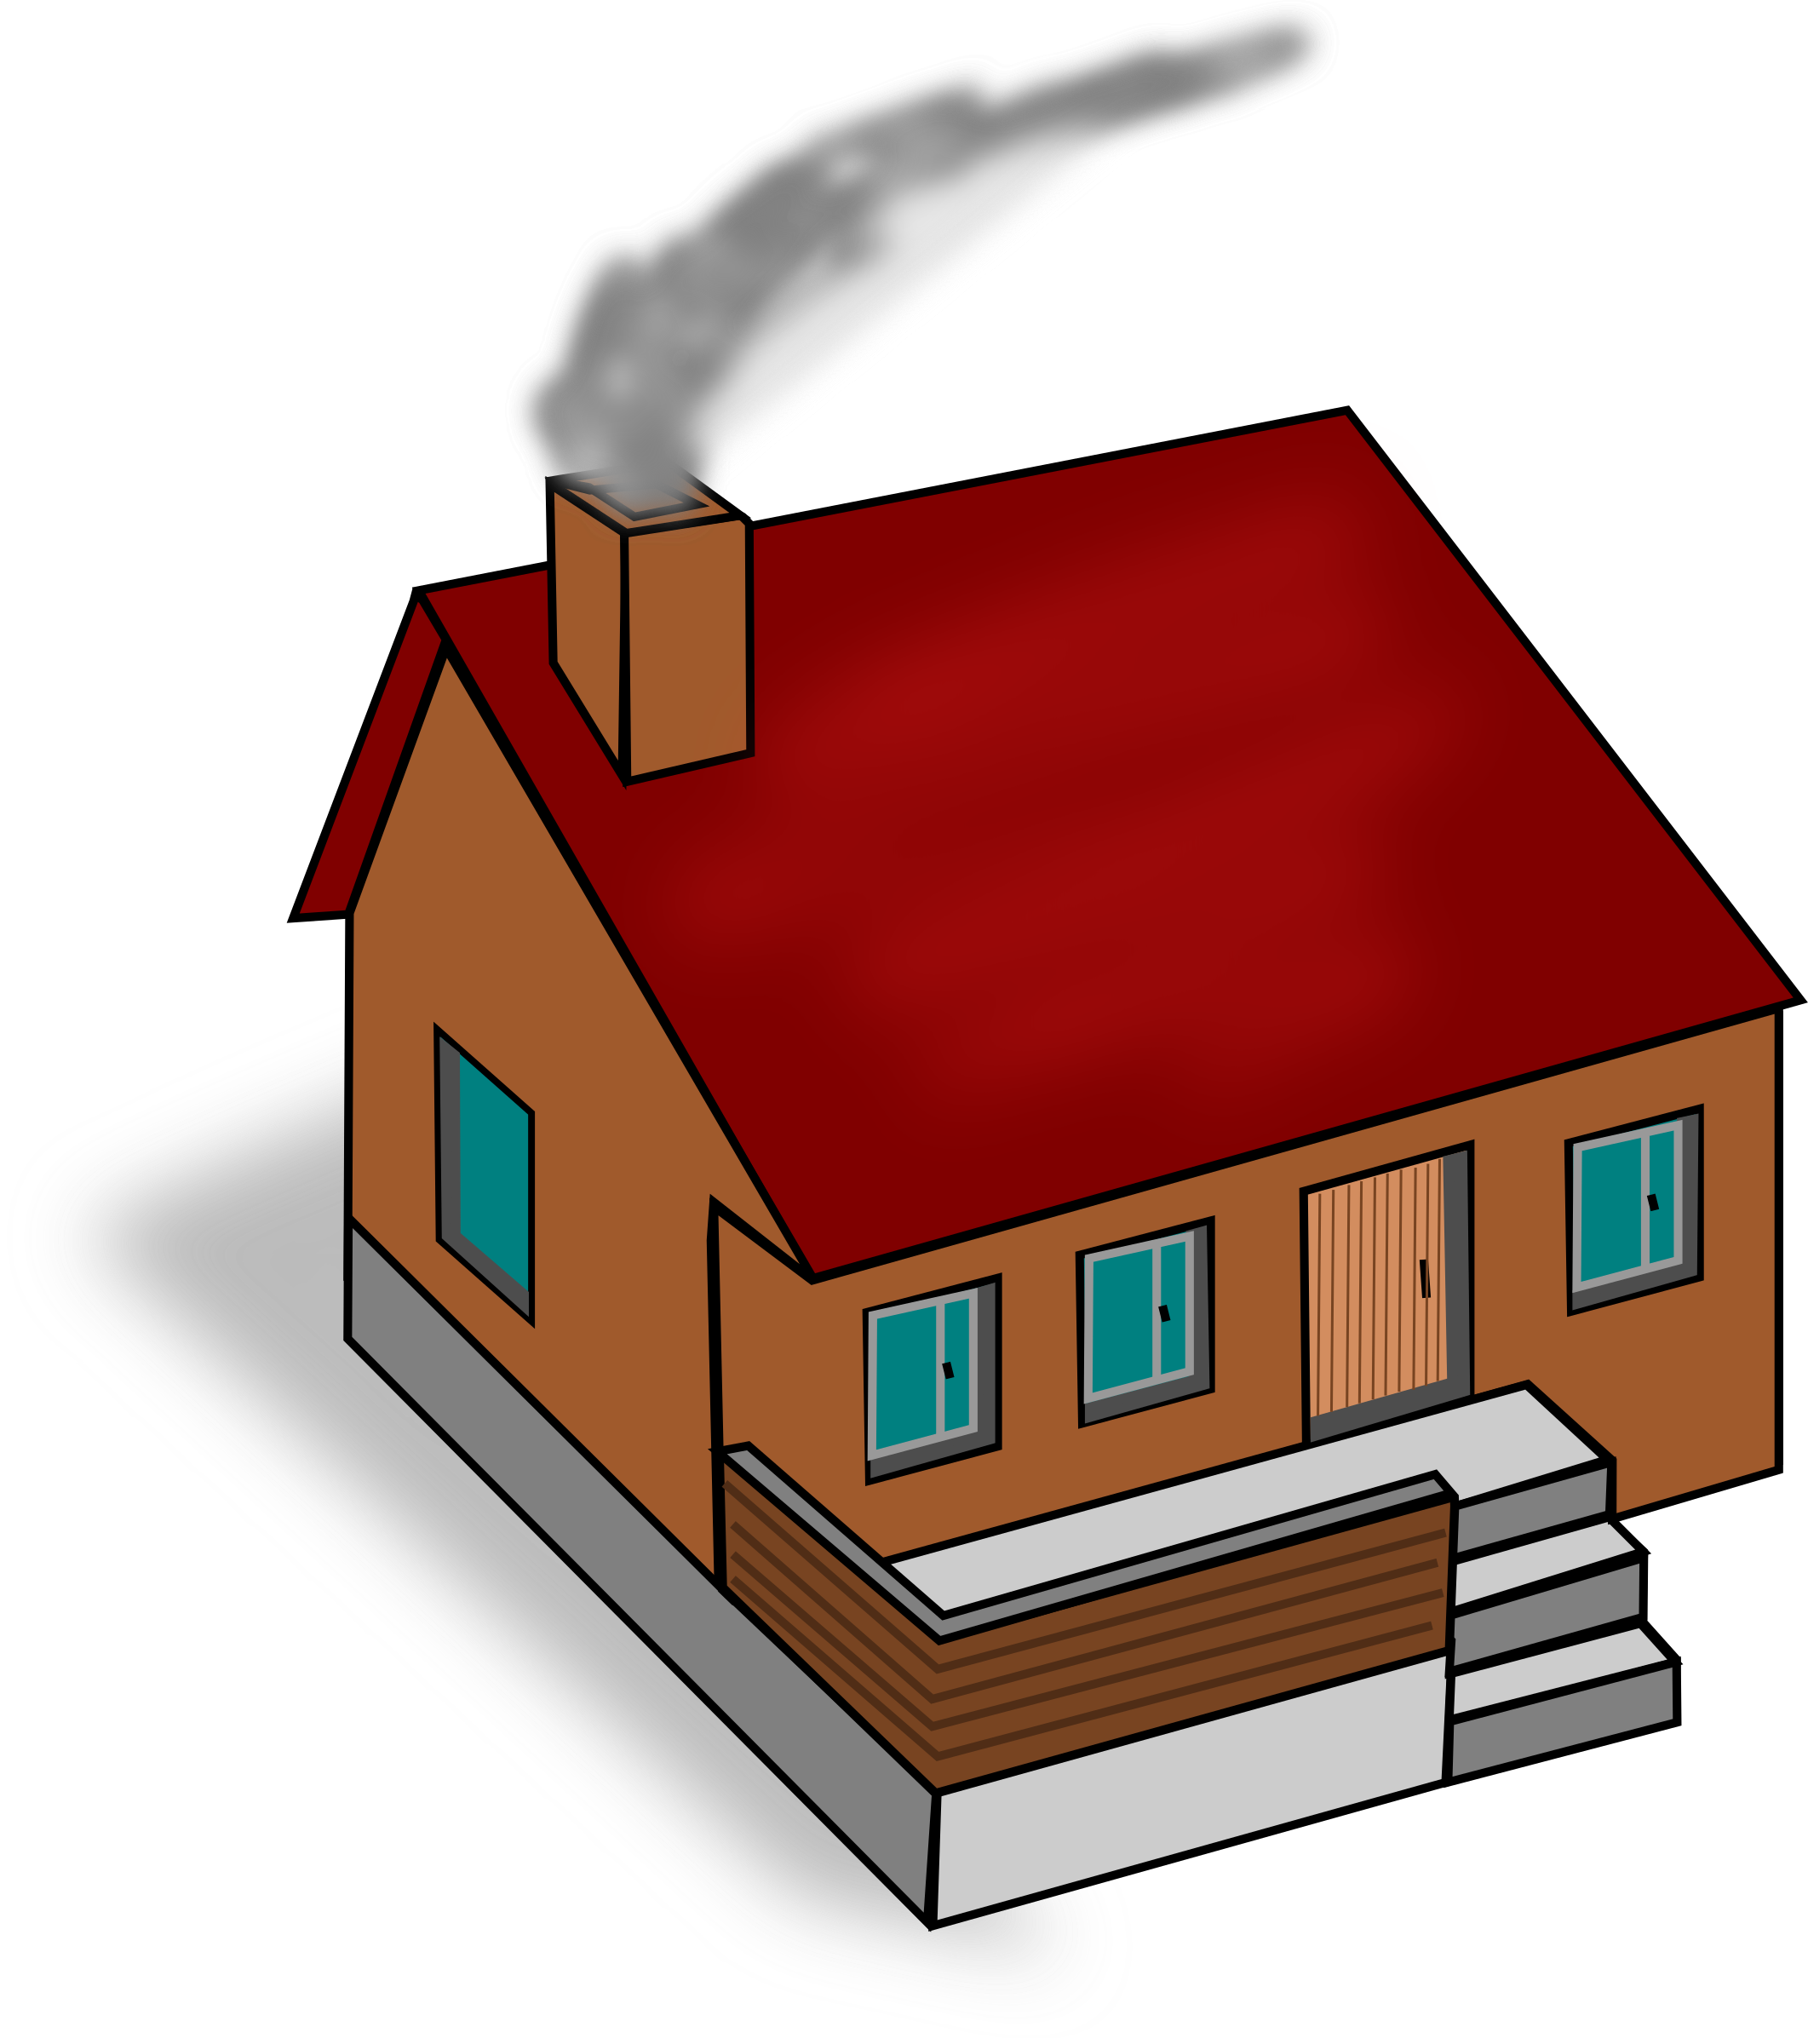 . House clipart diagram